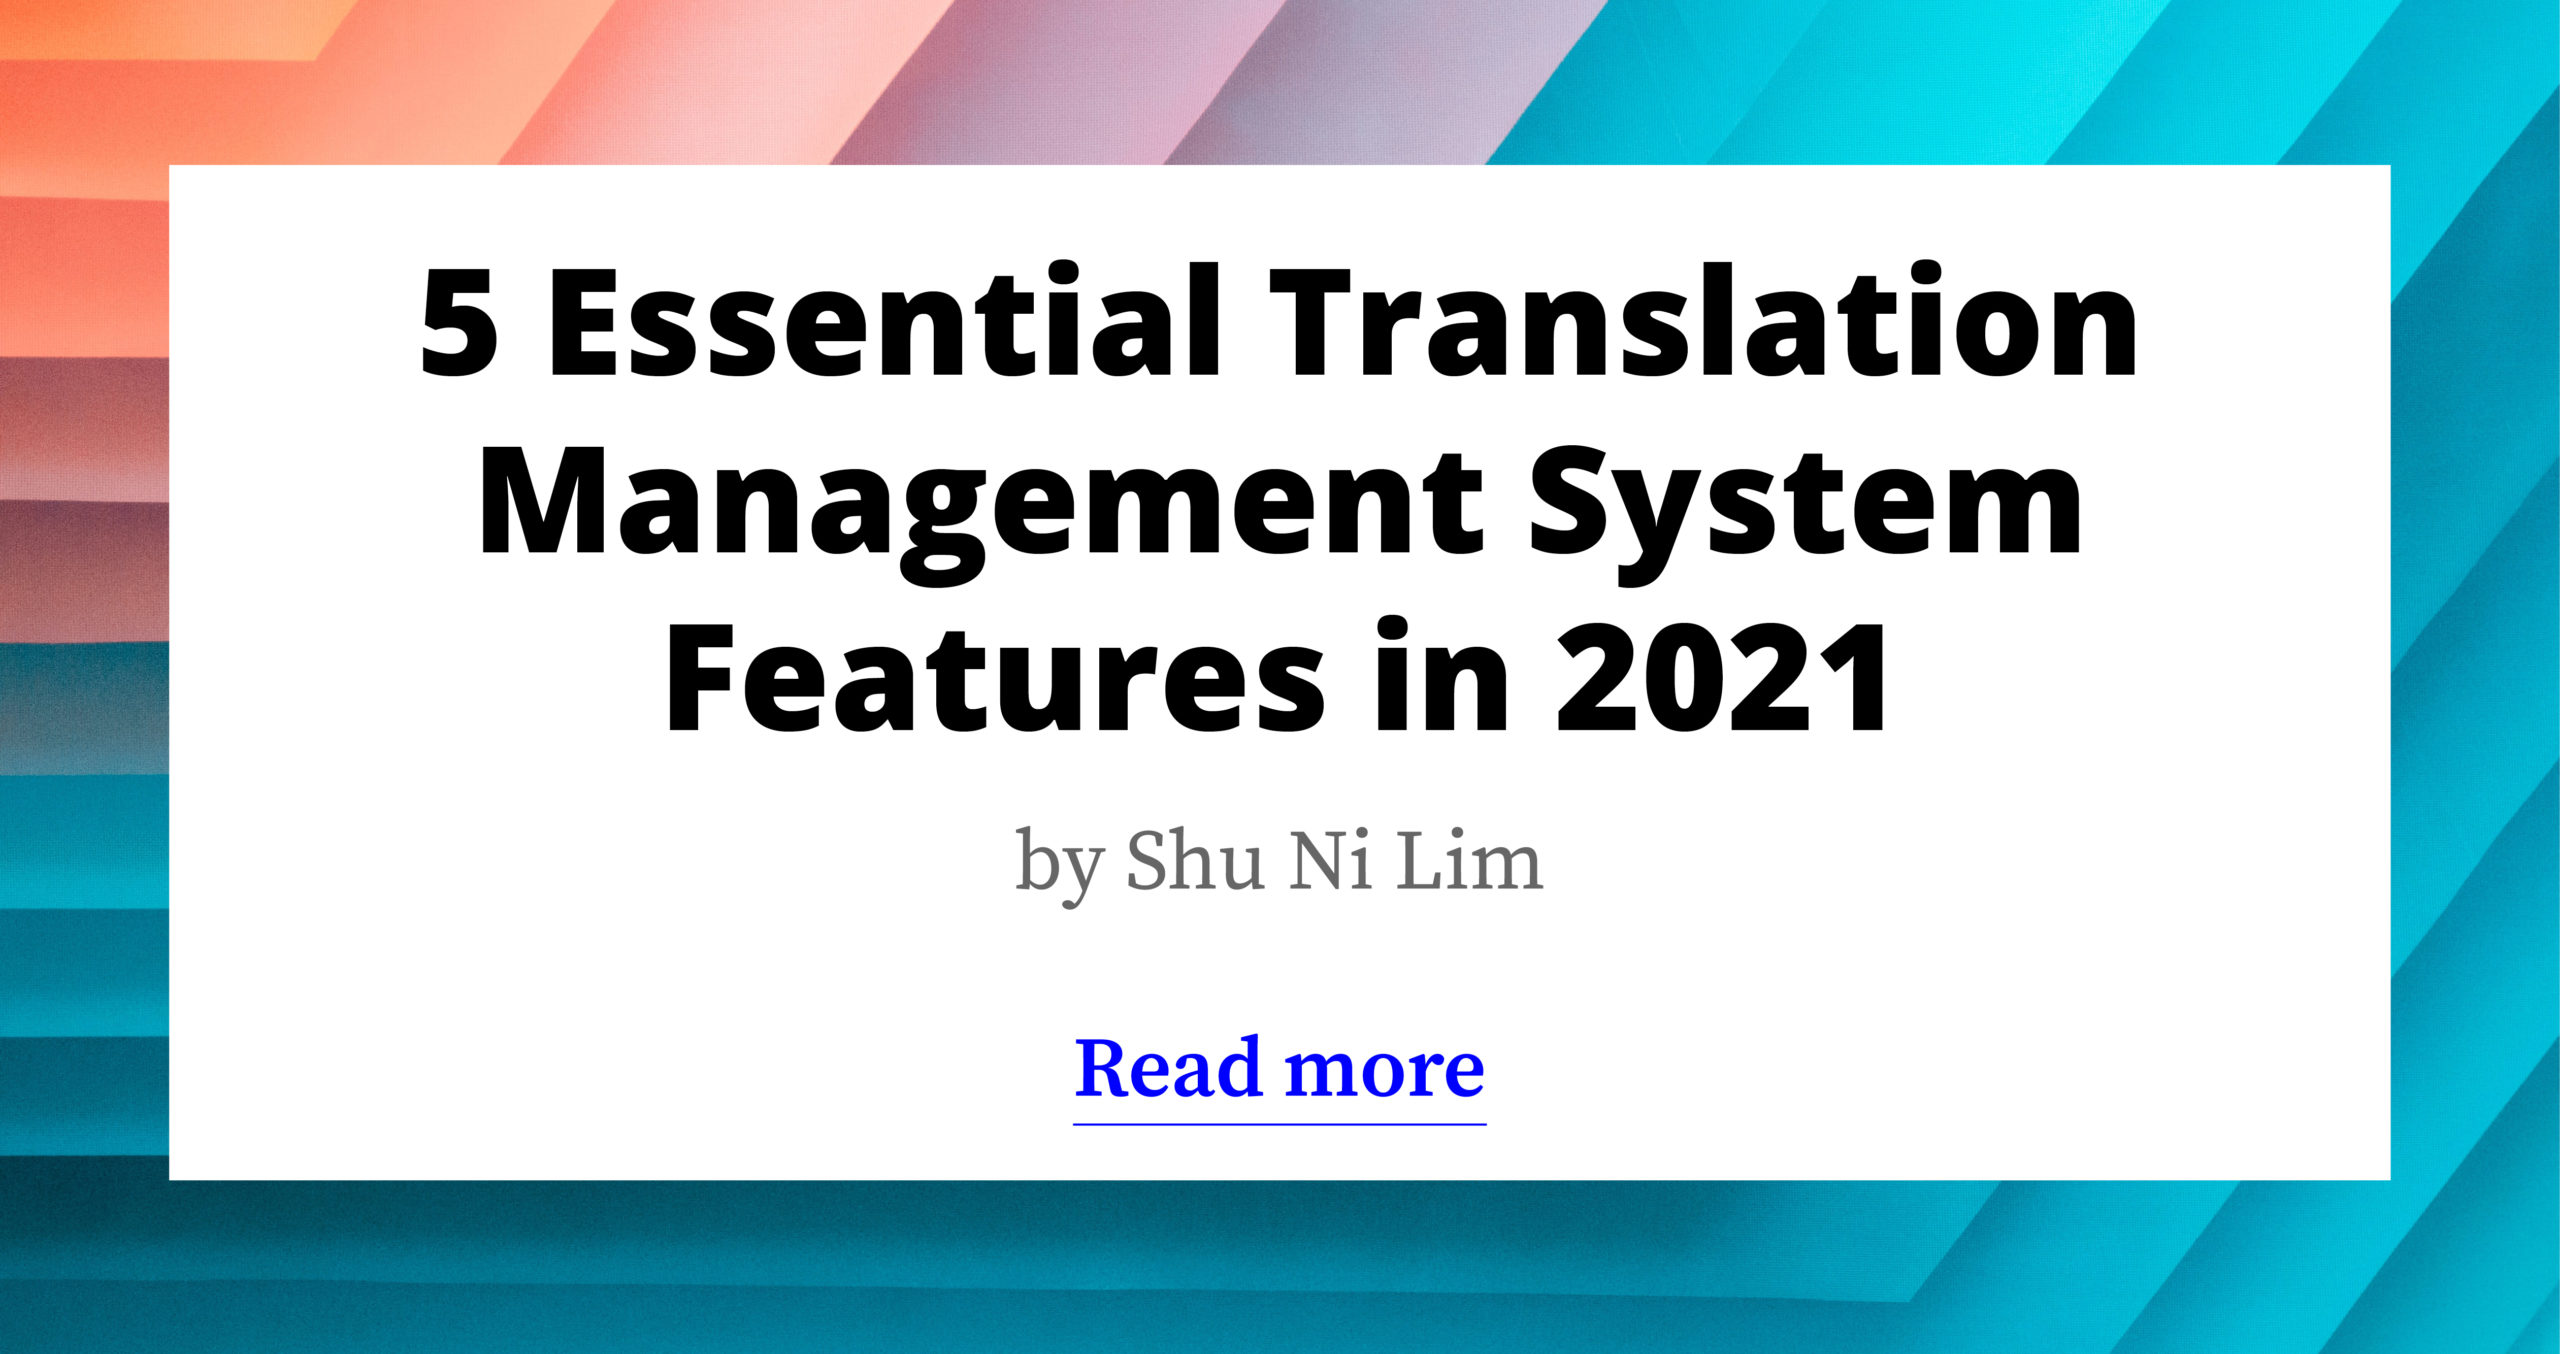 5 Essential Translation Management System Features (2021)